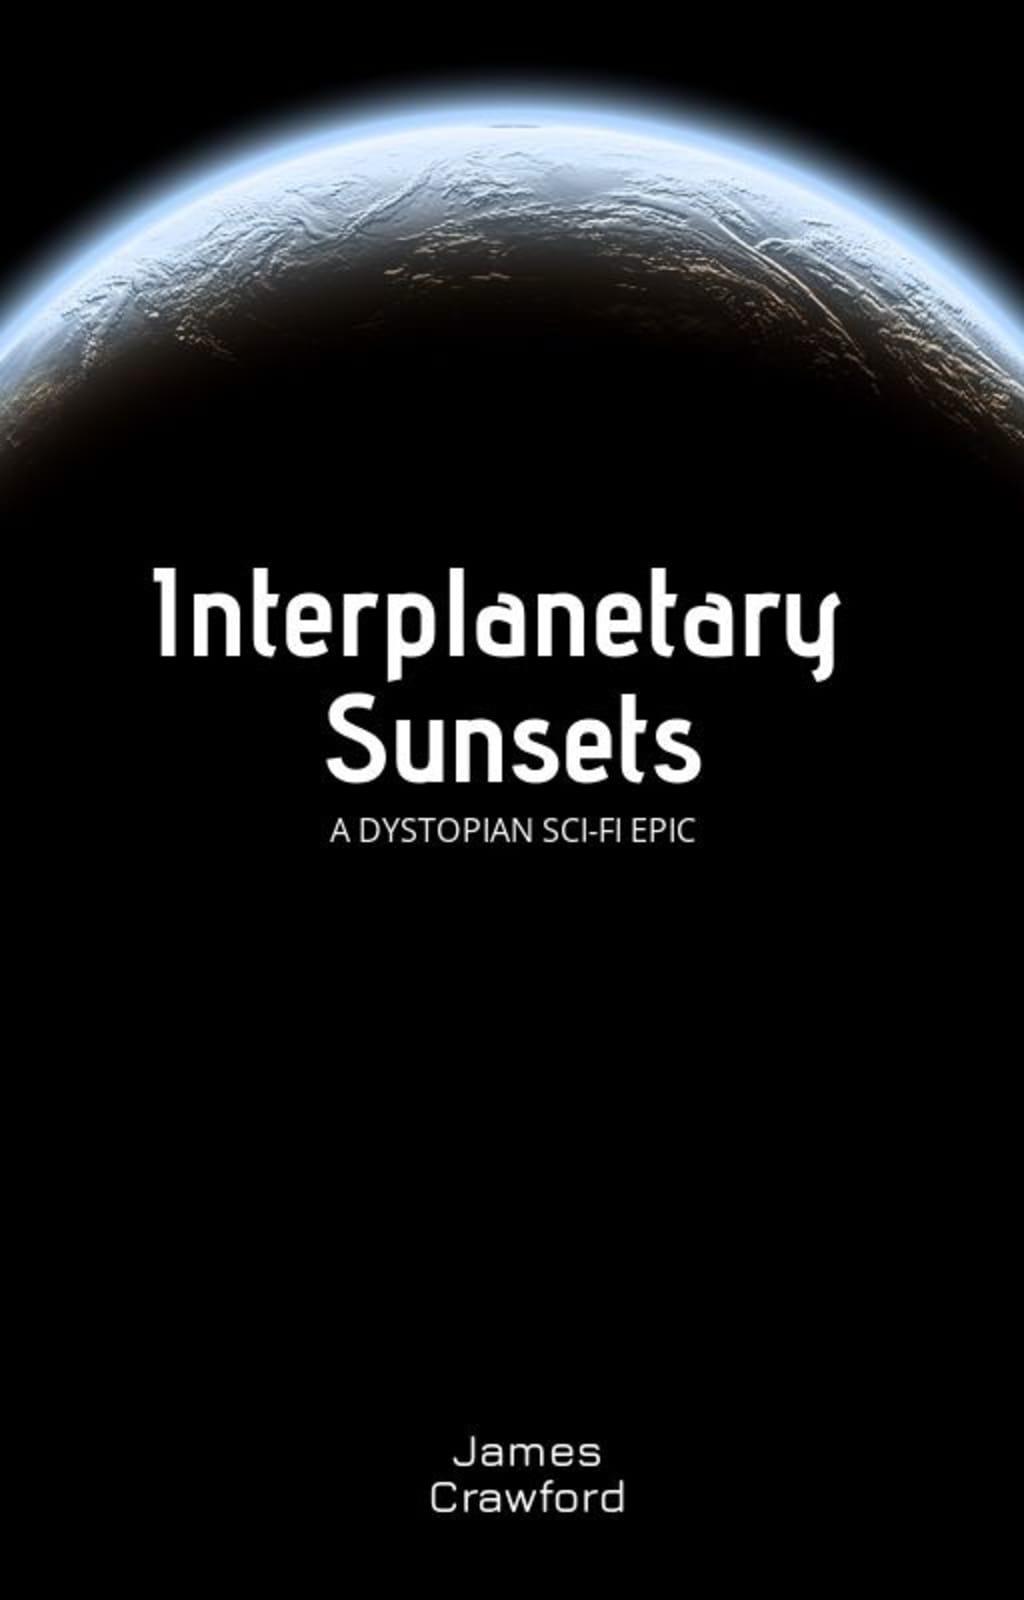 Interplanetary Sunsets (Chapter 2)